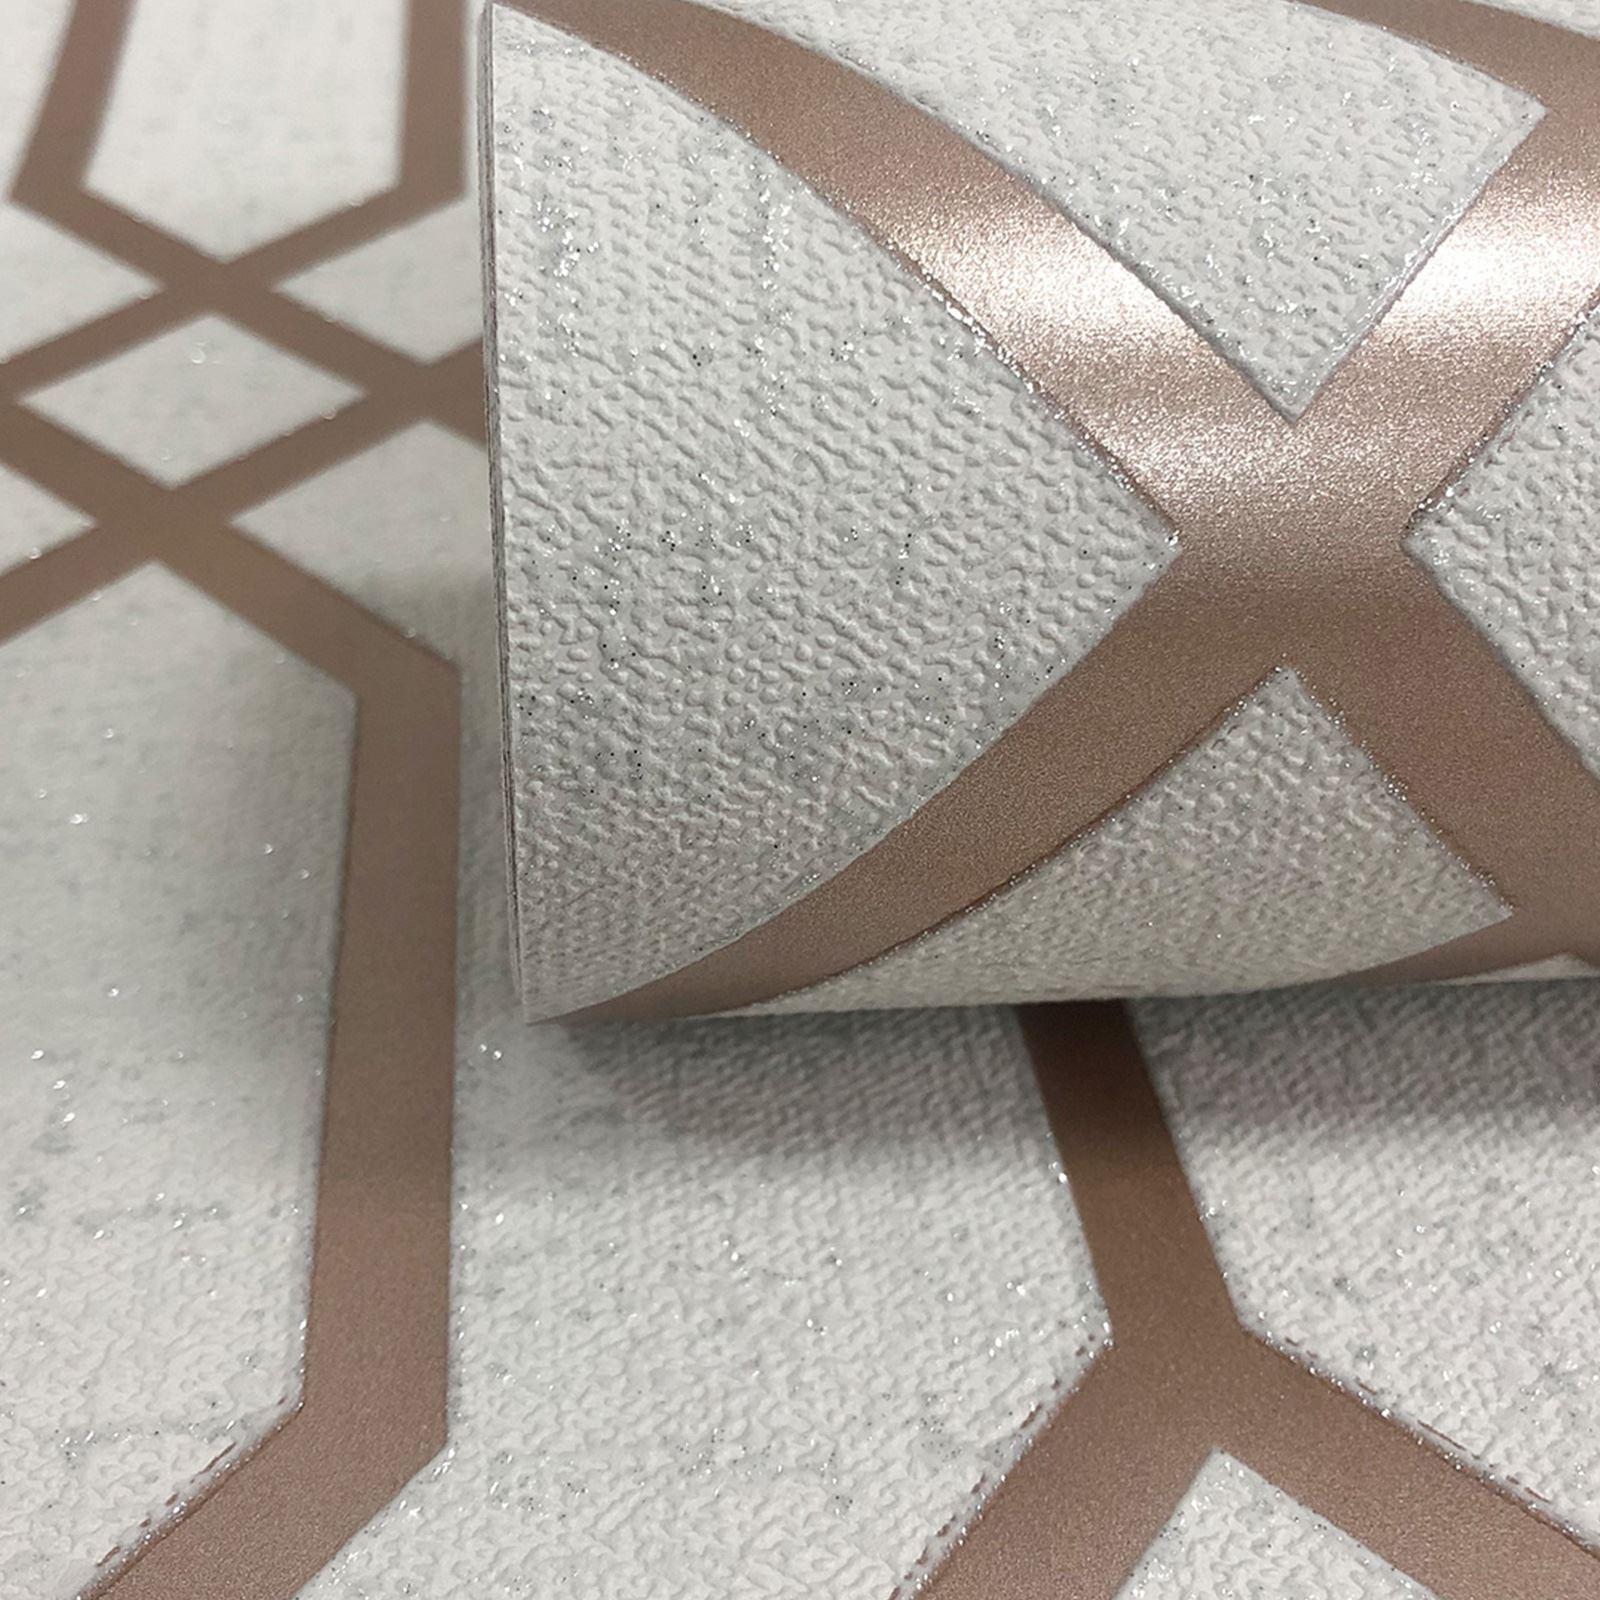 Trellis Wallpaper Metallic: FINE DECOR QUARTZ TRELLIS GEOMETRIC WALLPAPER TEXTURED